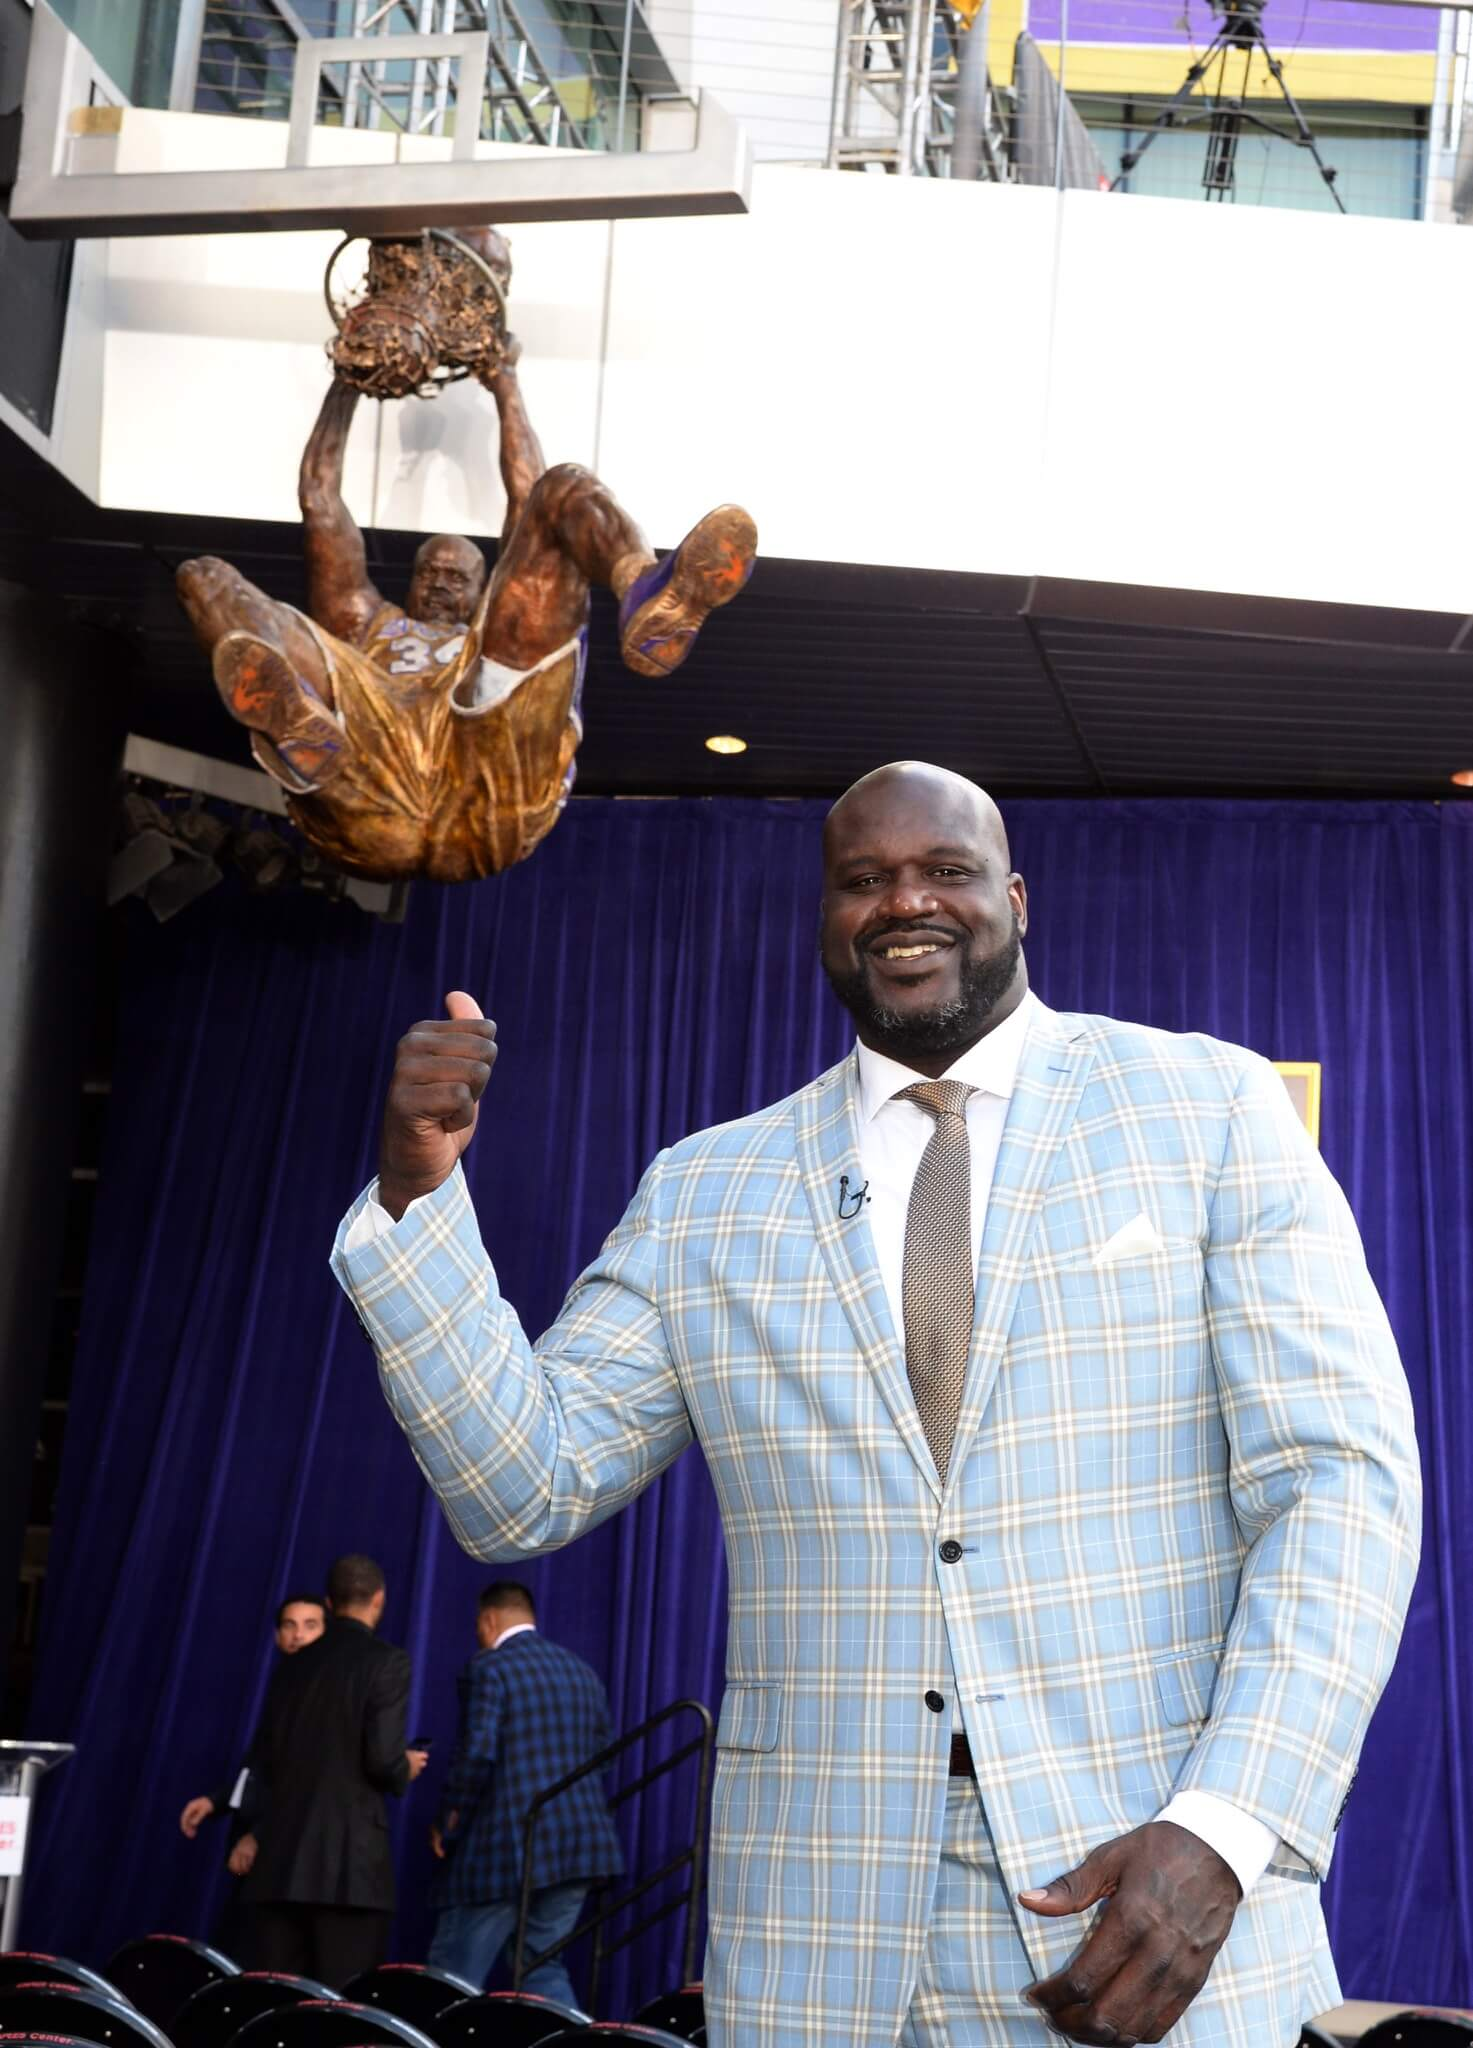 Shaq, statue, Shaquille O'Neal, LA Lakers, NBA